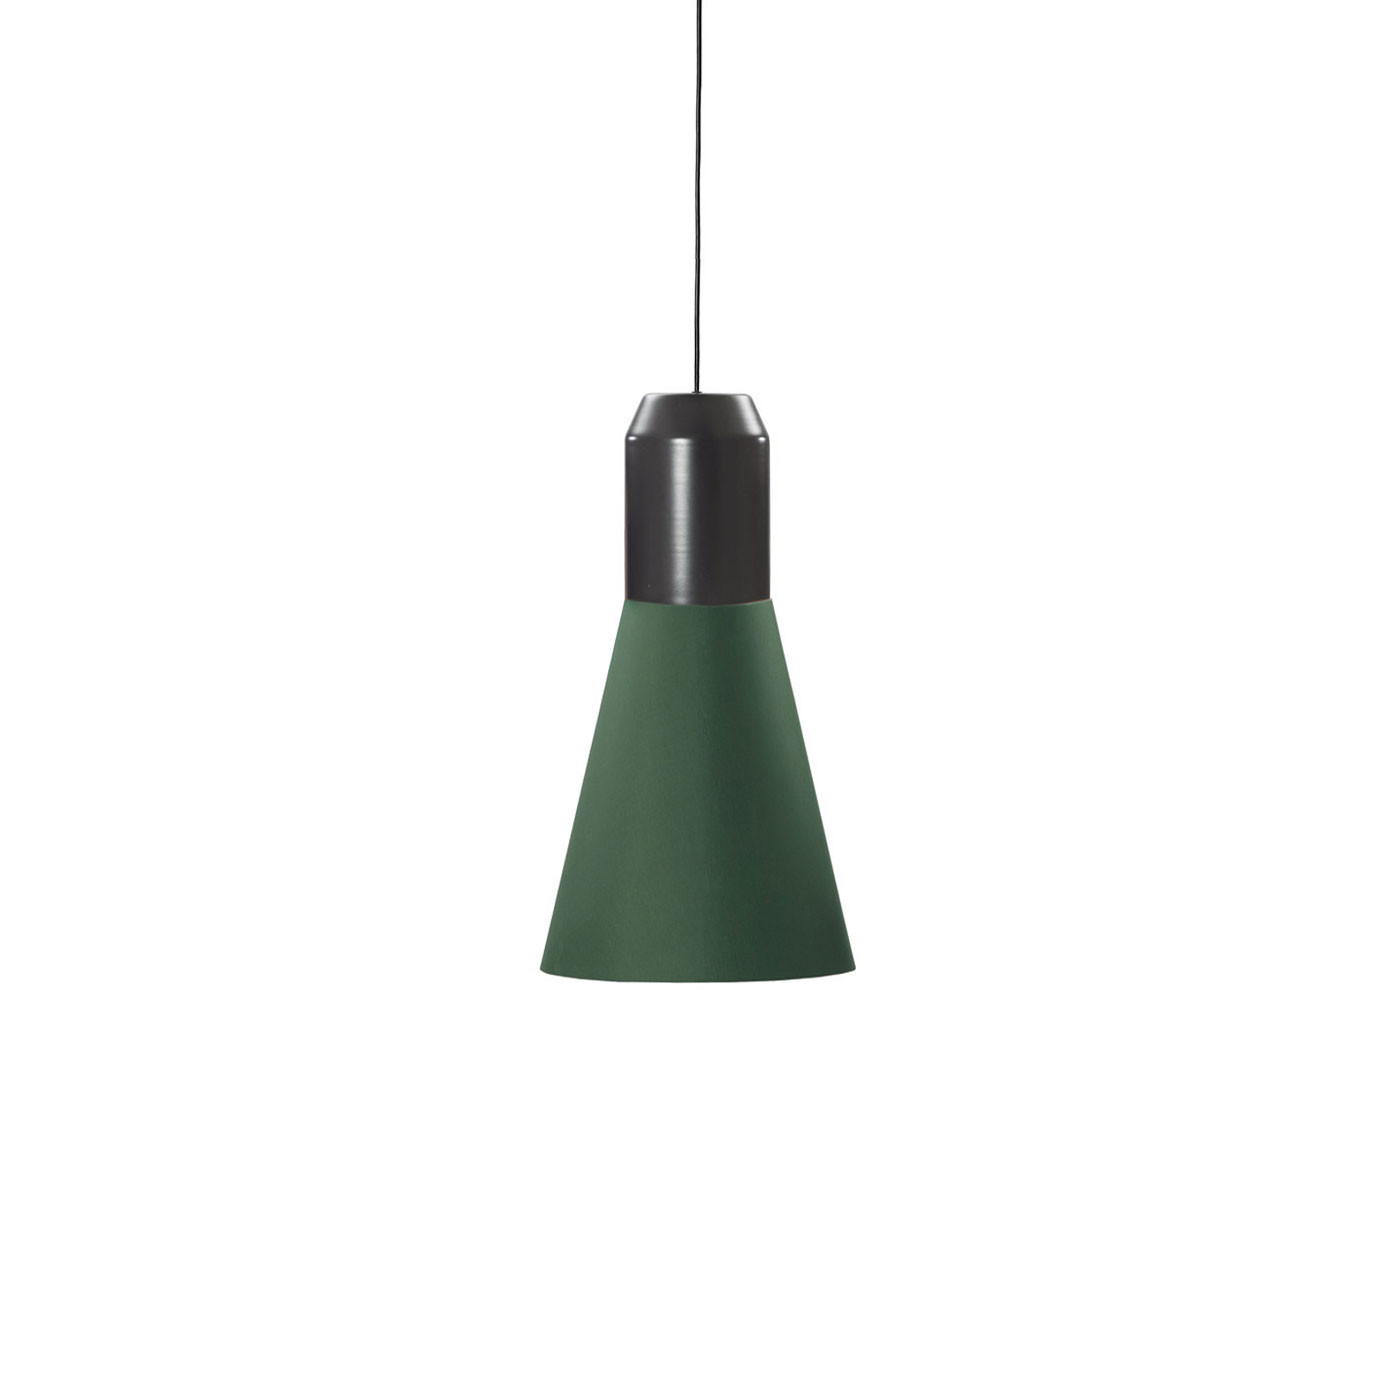 ClassiCon Bell Light Stoff Grün Pendelleuchte